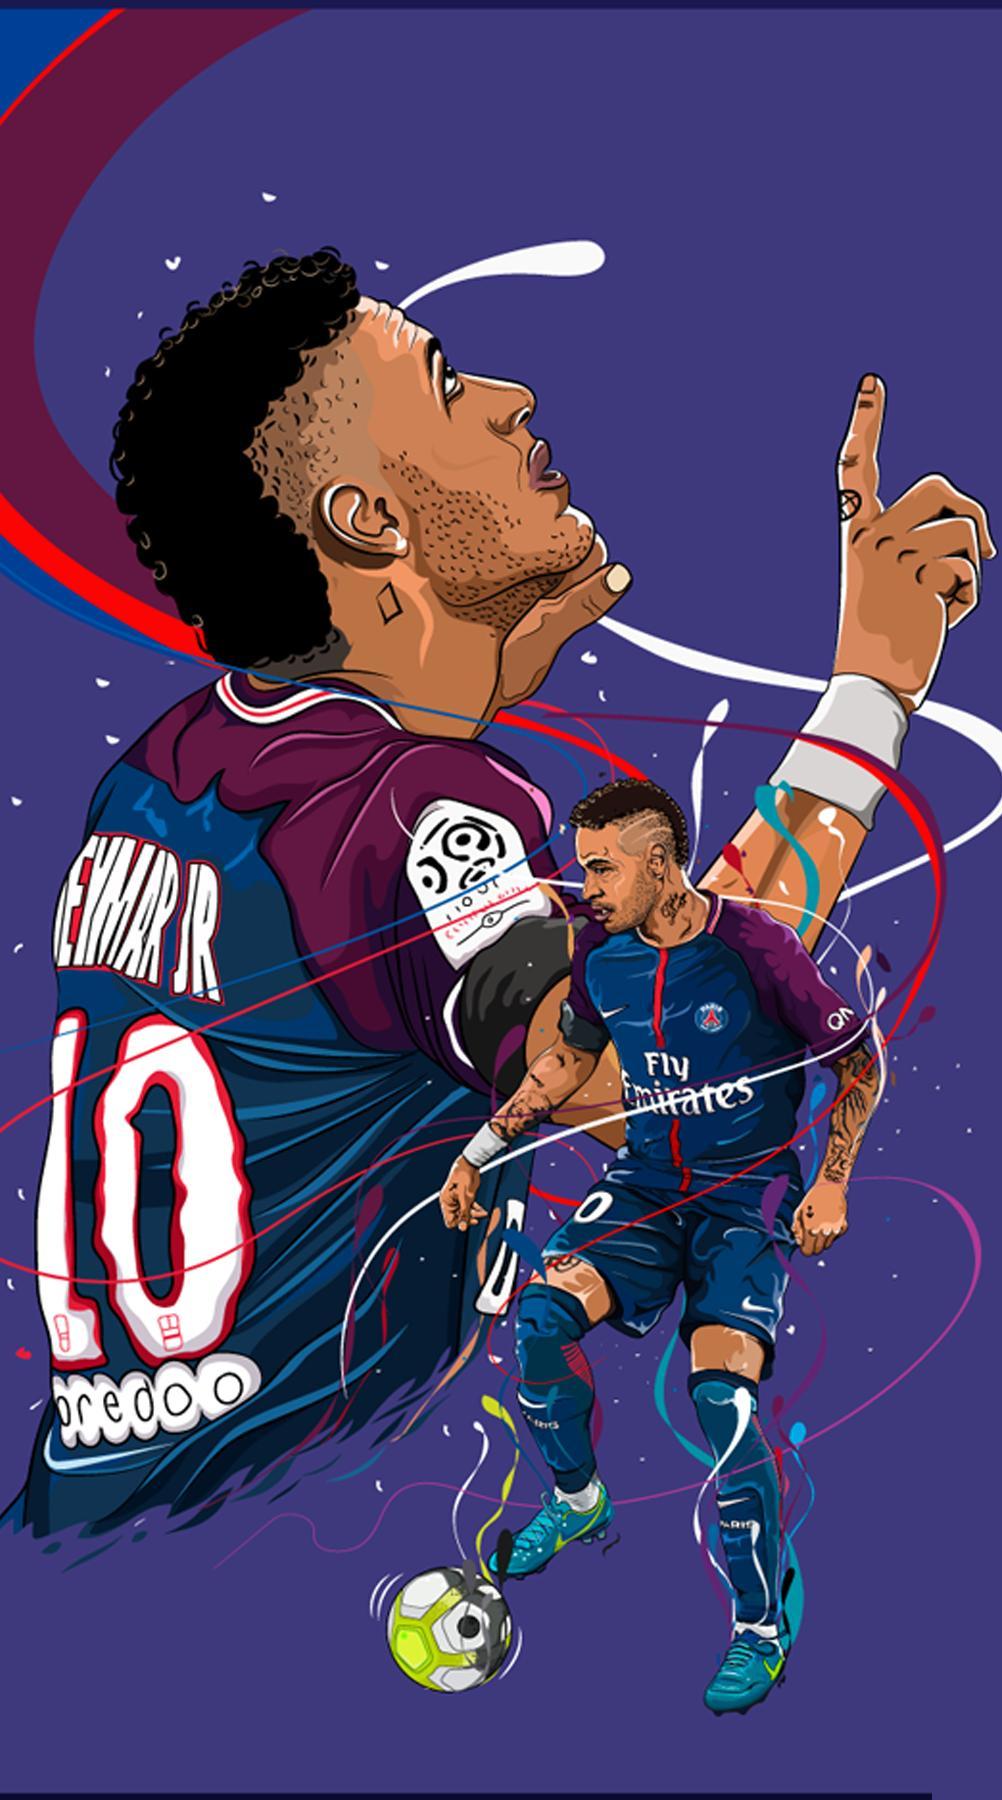 Neymar Cartoon Wallpapers - Wallpaper Cave